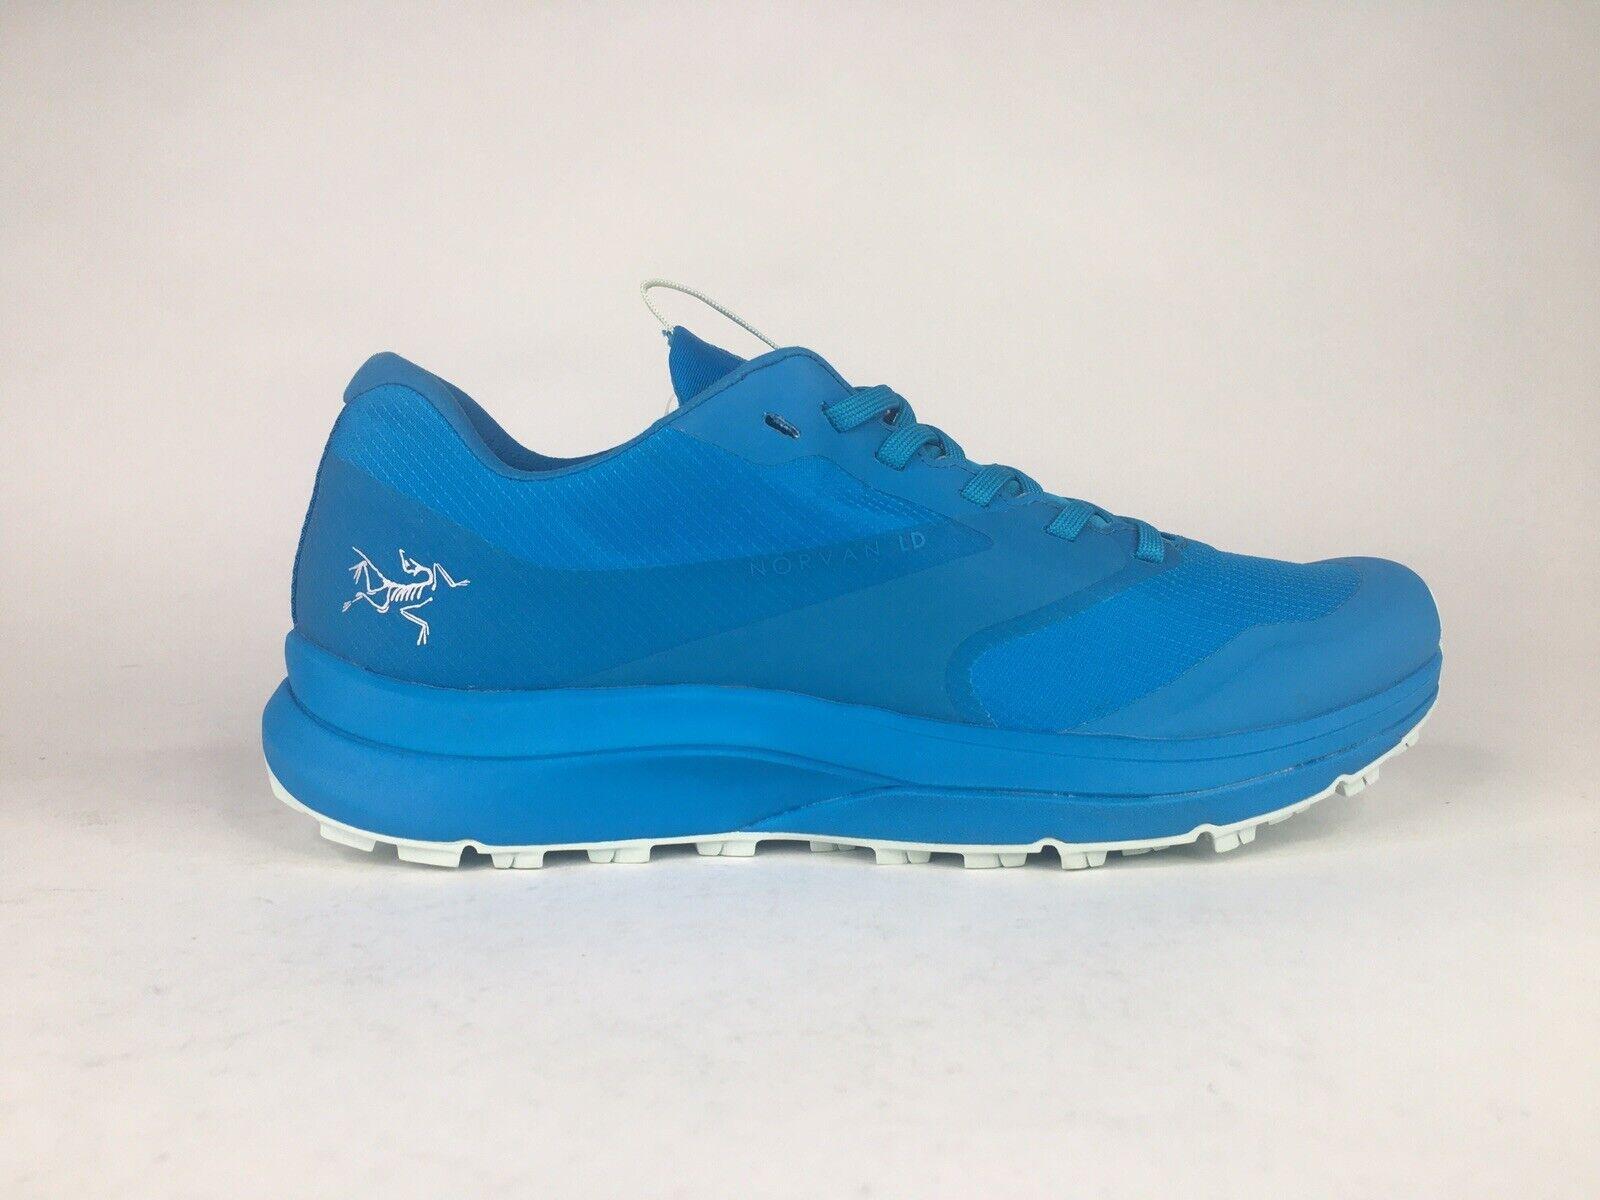 Arc 'teryx Femme Norvan LD GTX Sz 7 Bleu Imperméable Gore-Tex Trail Chaussures De Randonnée